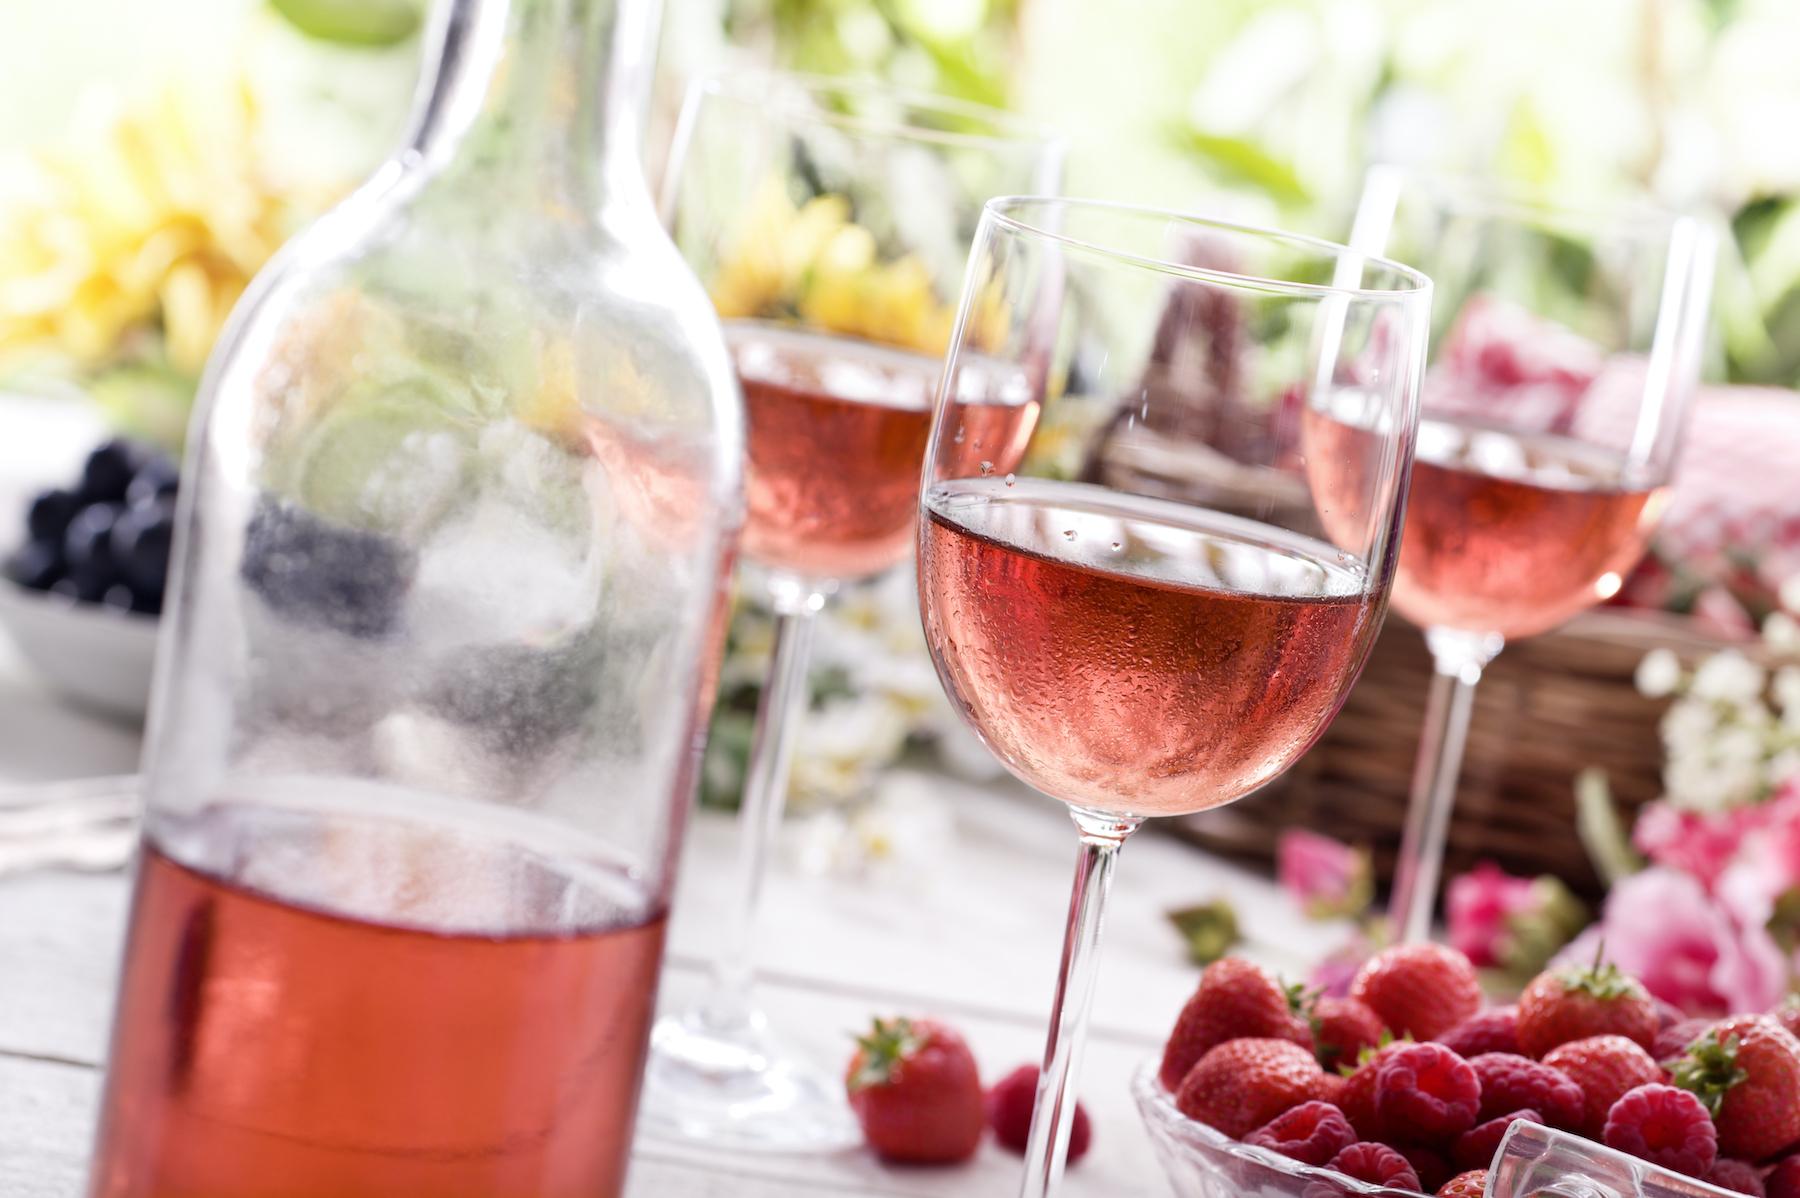 Summer-Rose-Wine-173271458 4256x2832